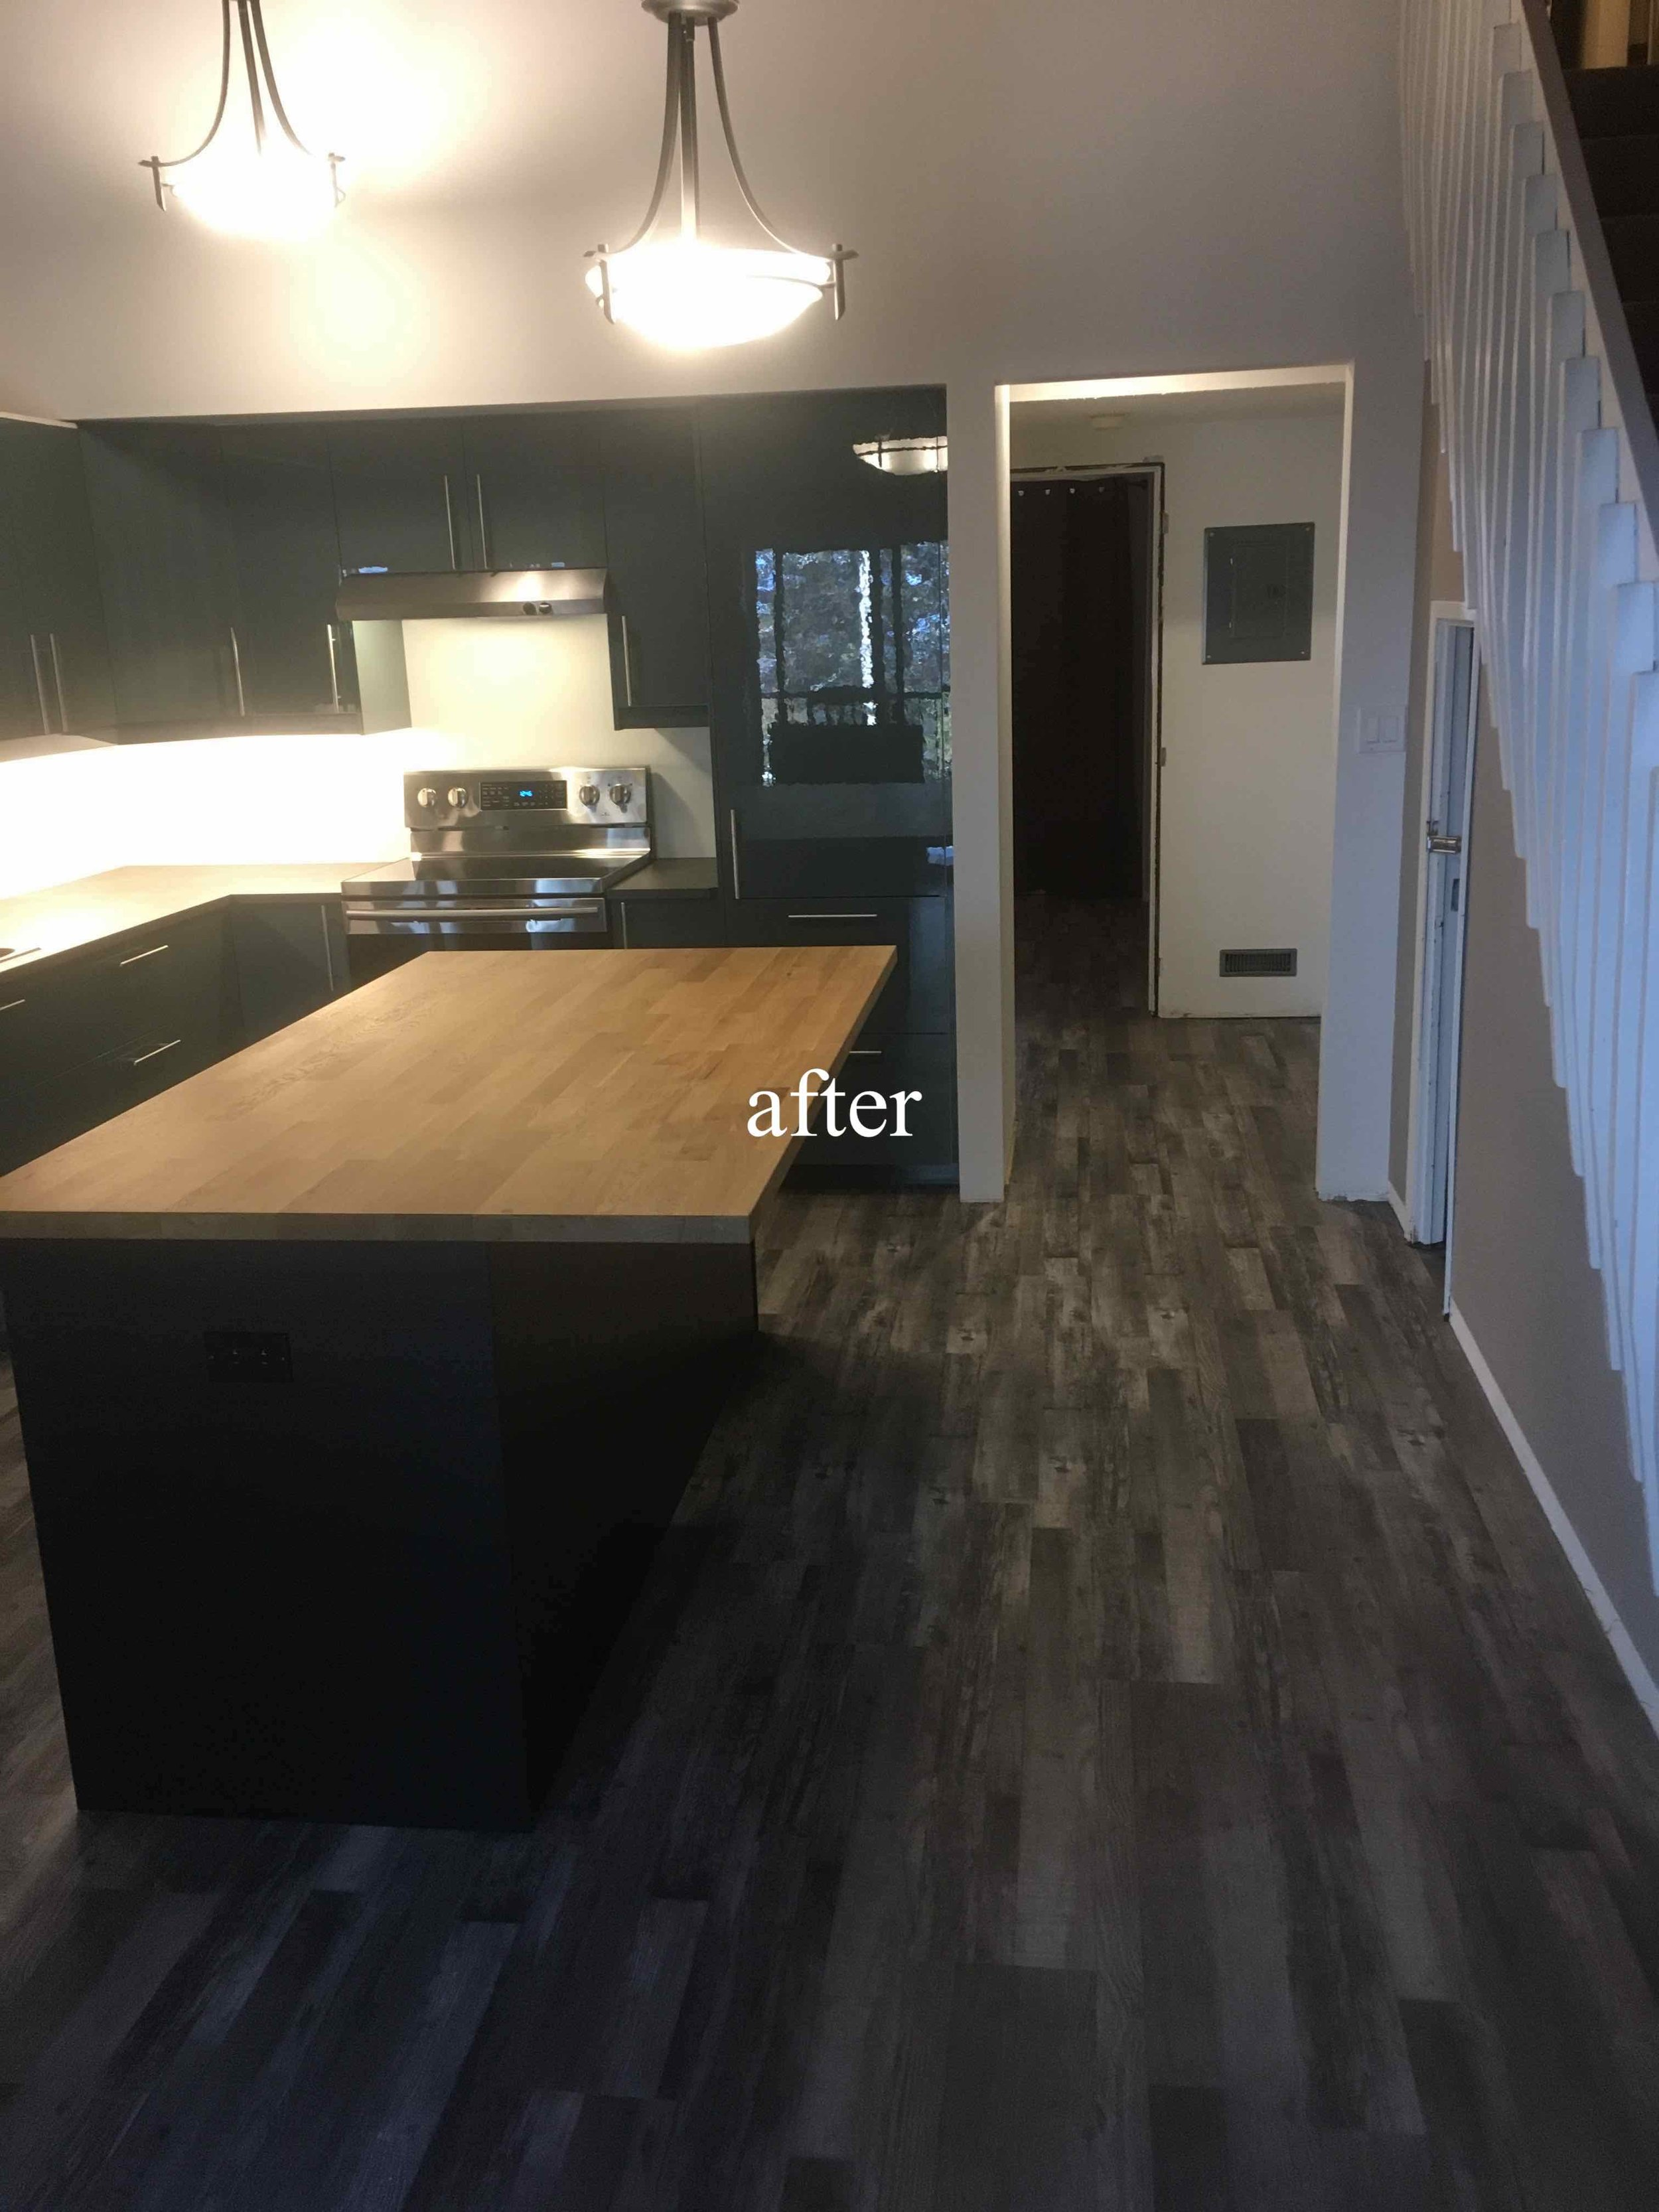 Kimberley ski condo kitchen renovation after photo.